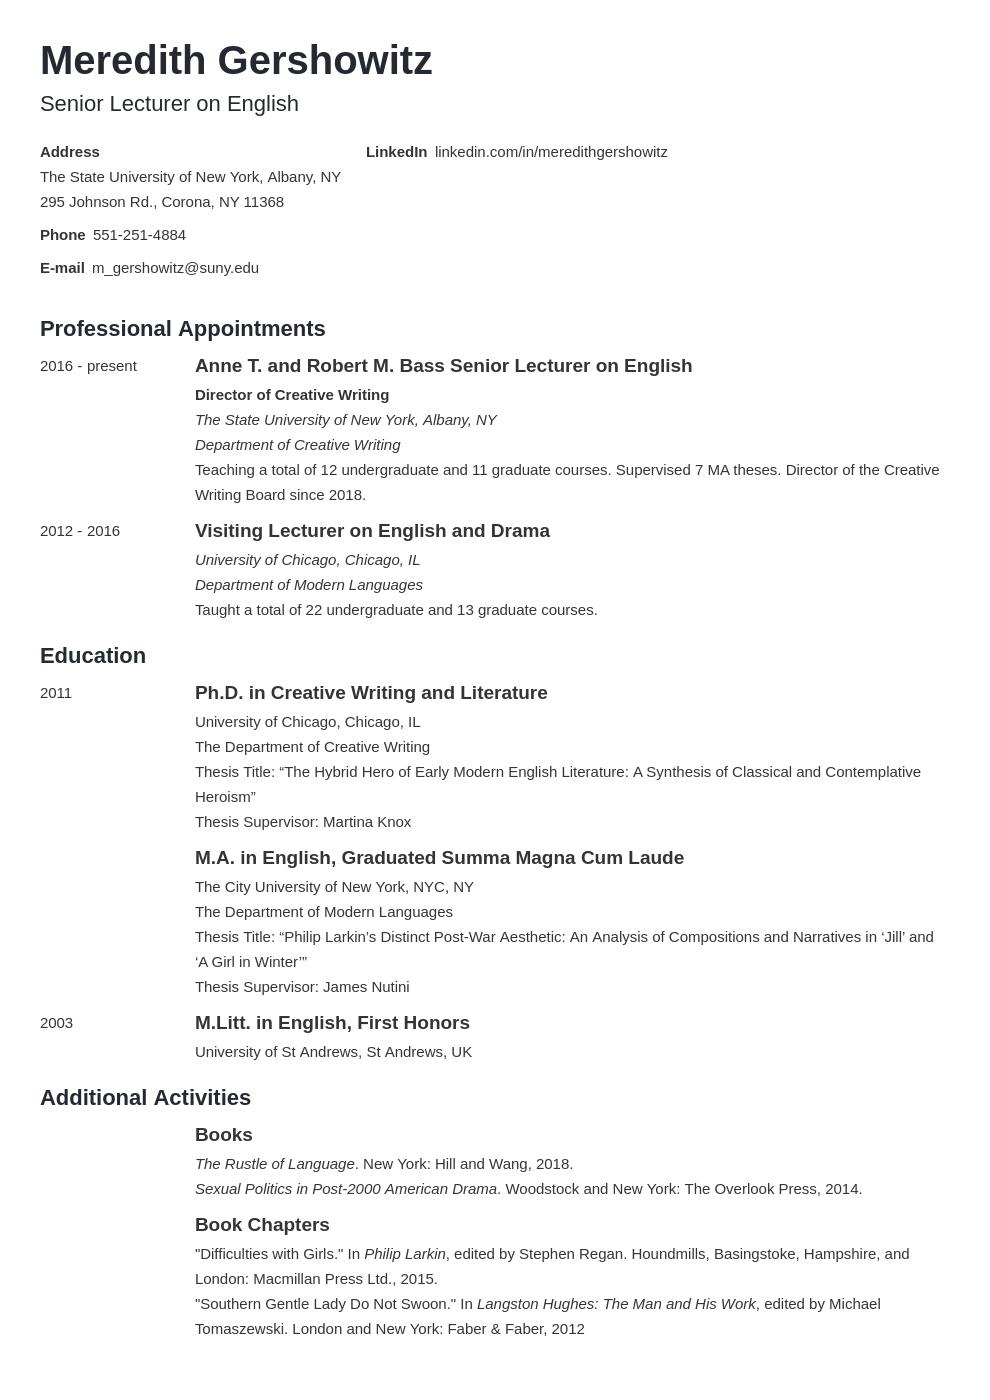 academic cv example template minimo in 2020 Cv template